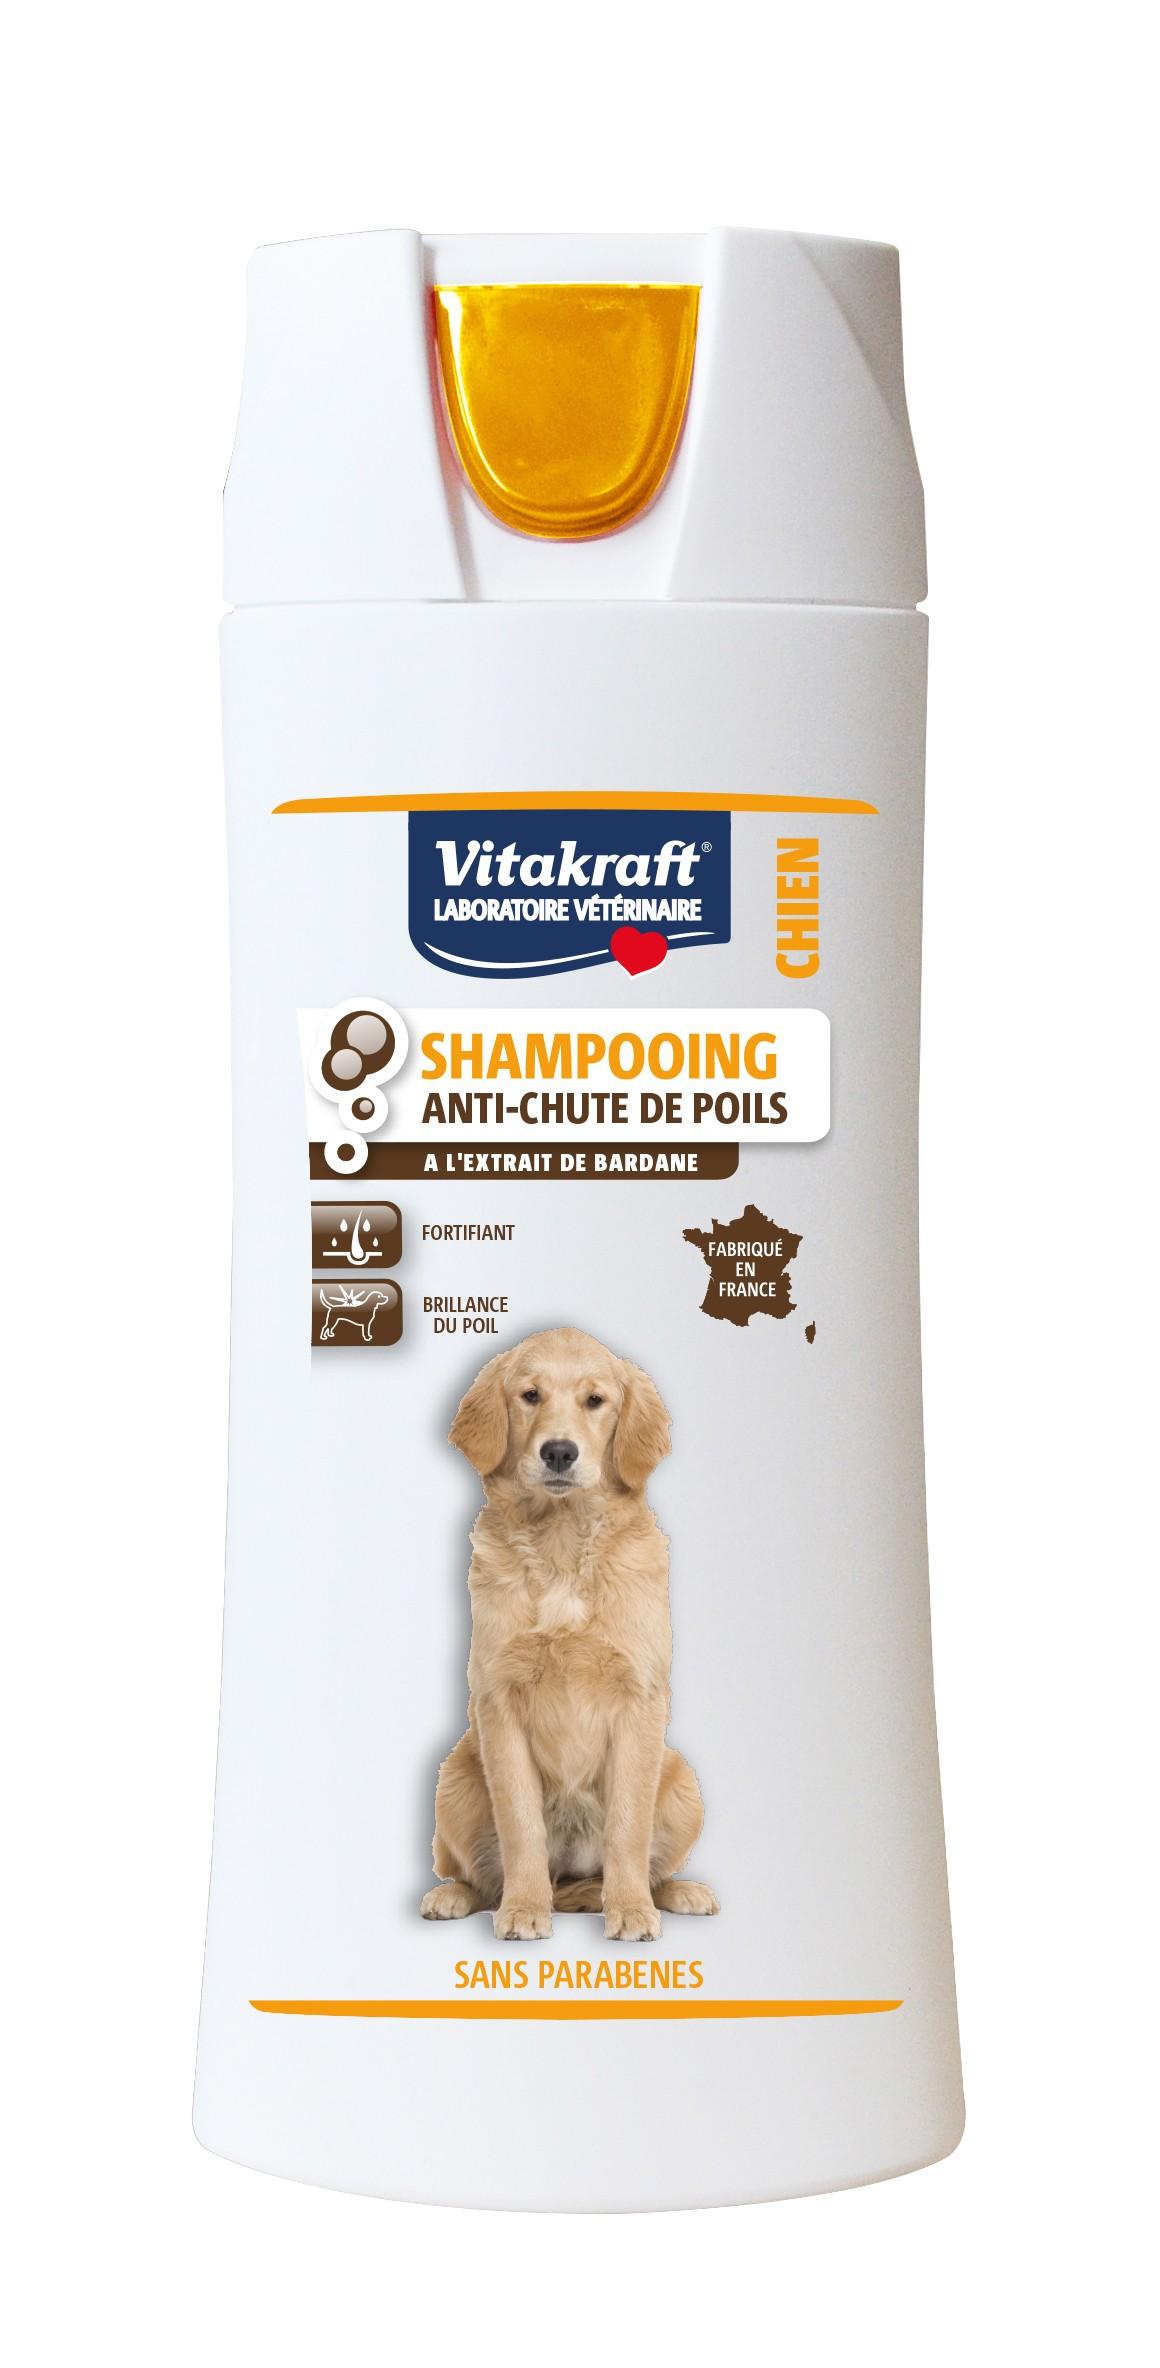 Shampooing anti-chute de poils